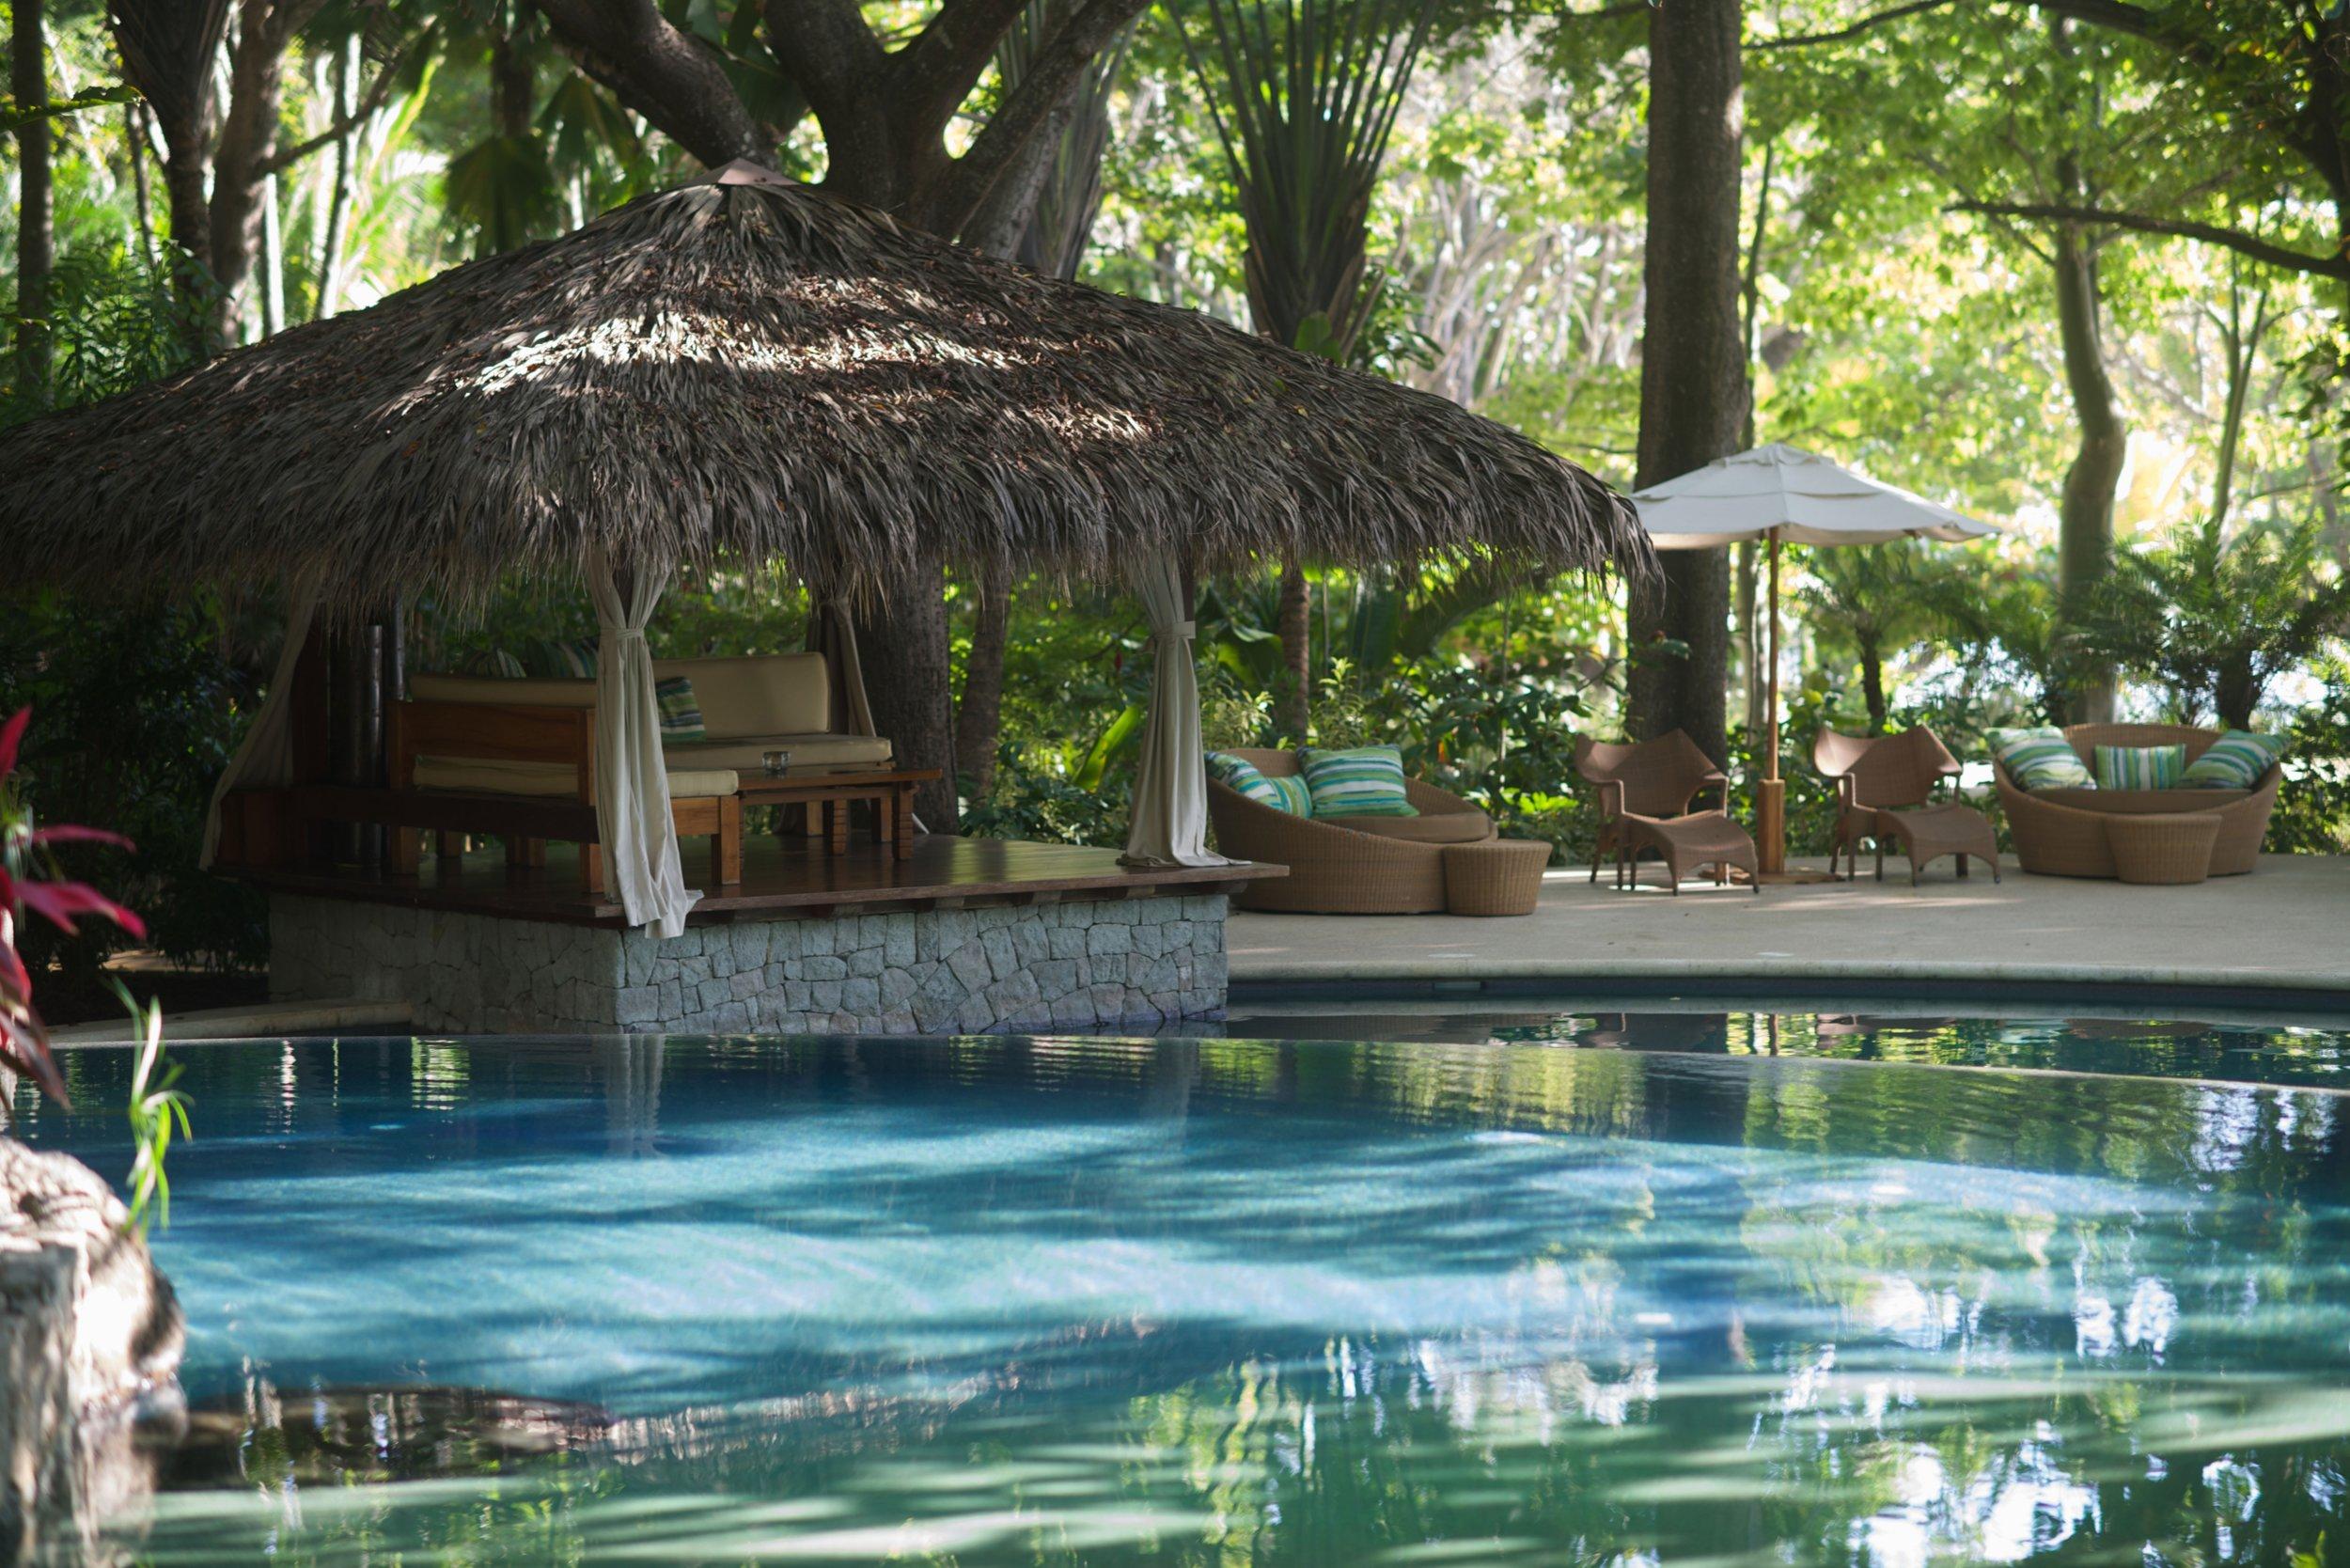 pool-and-palapa (1).jpg